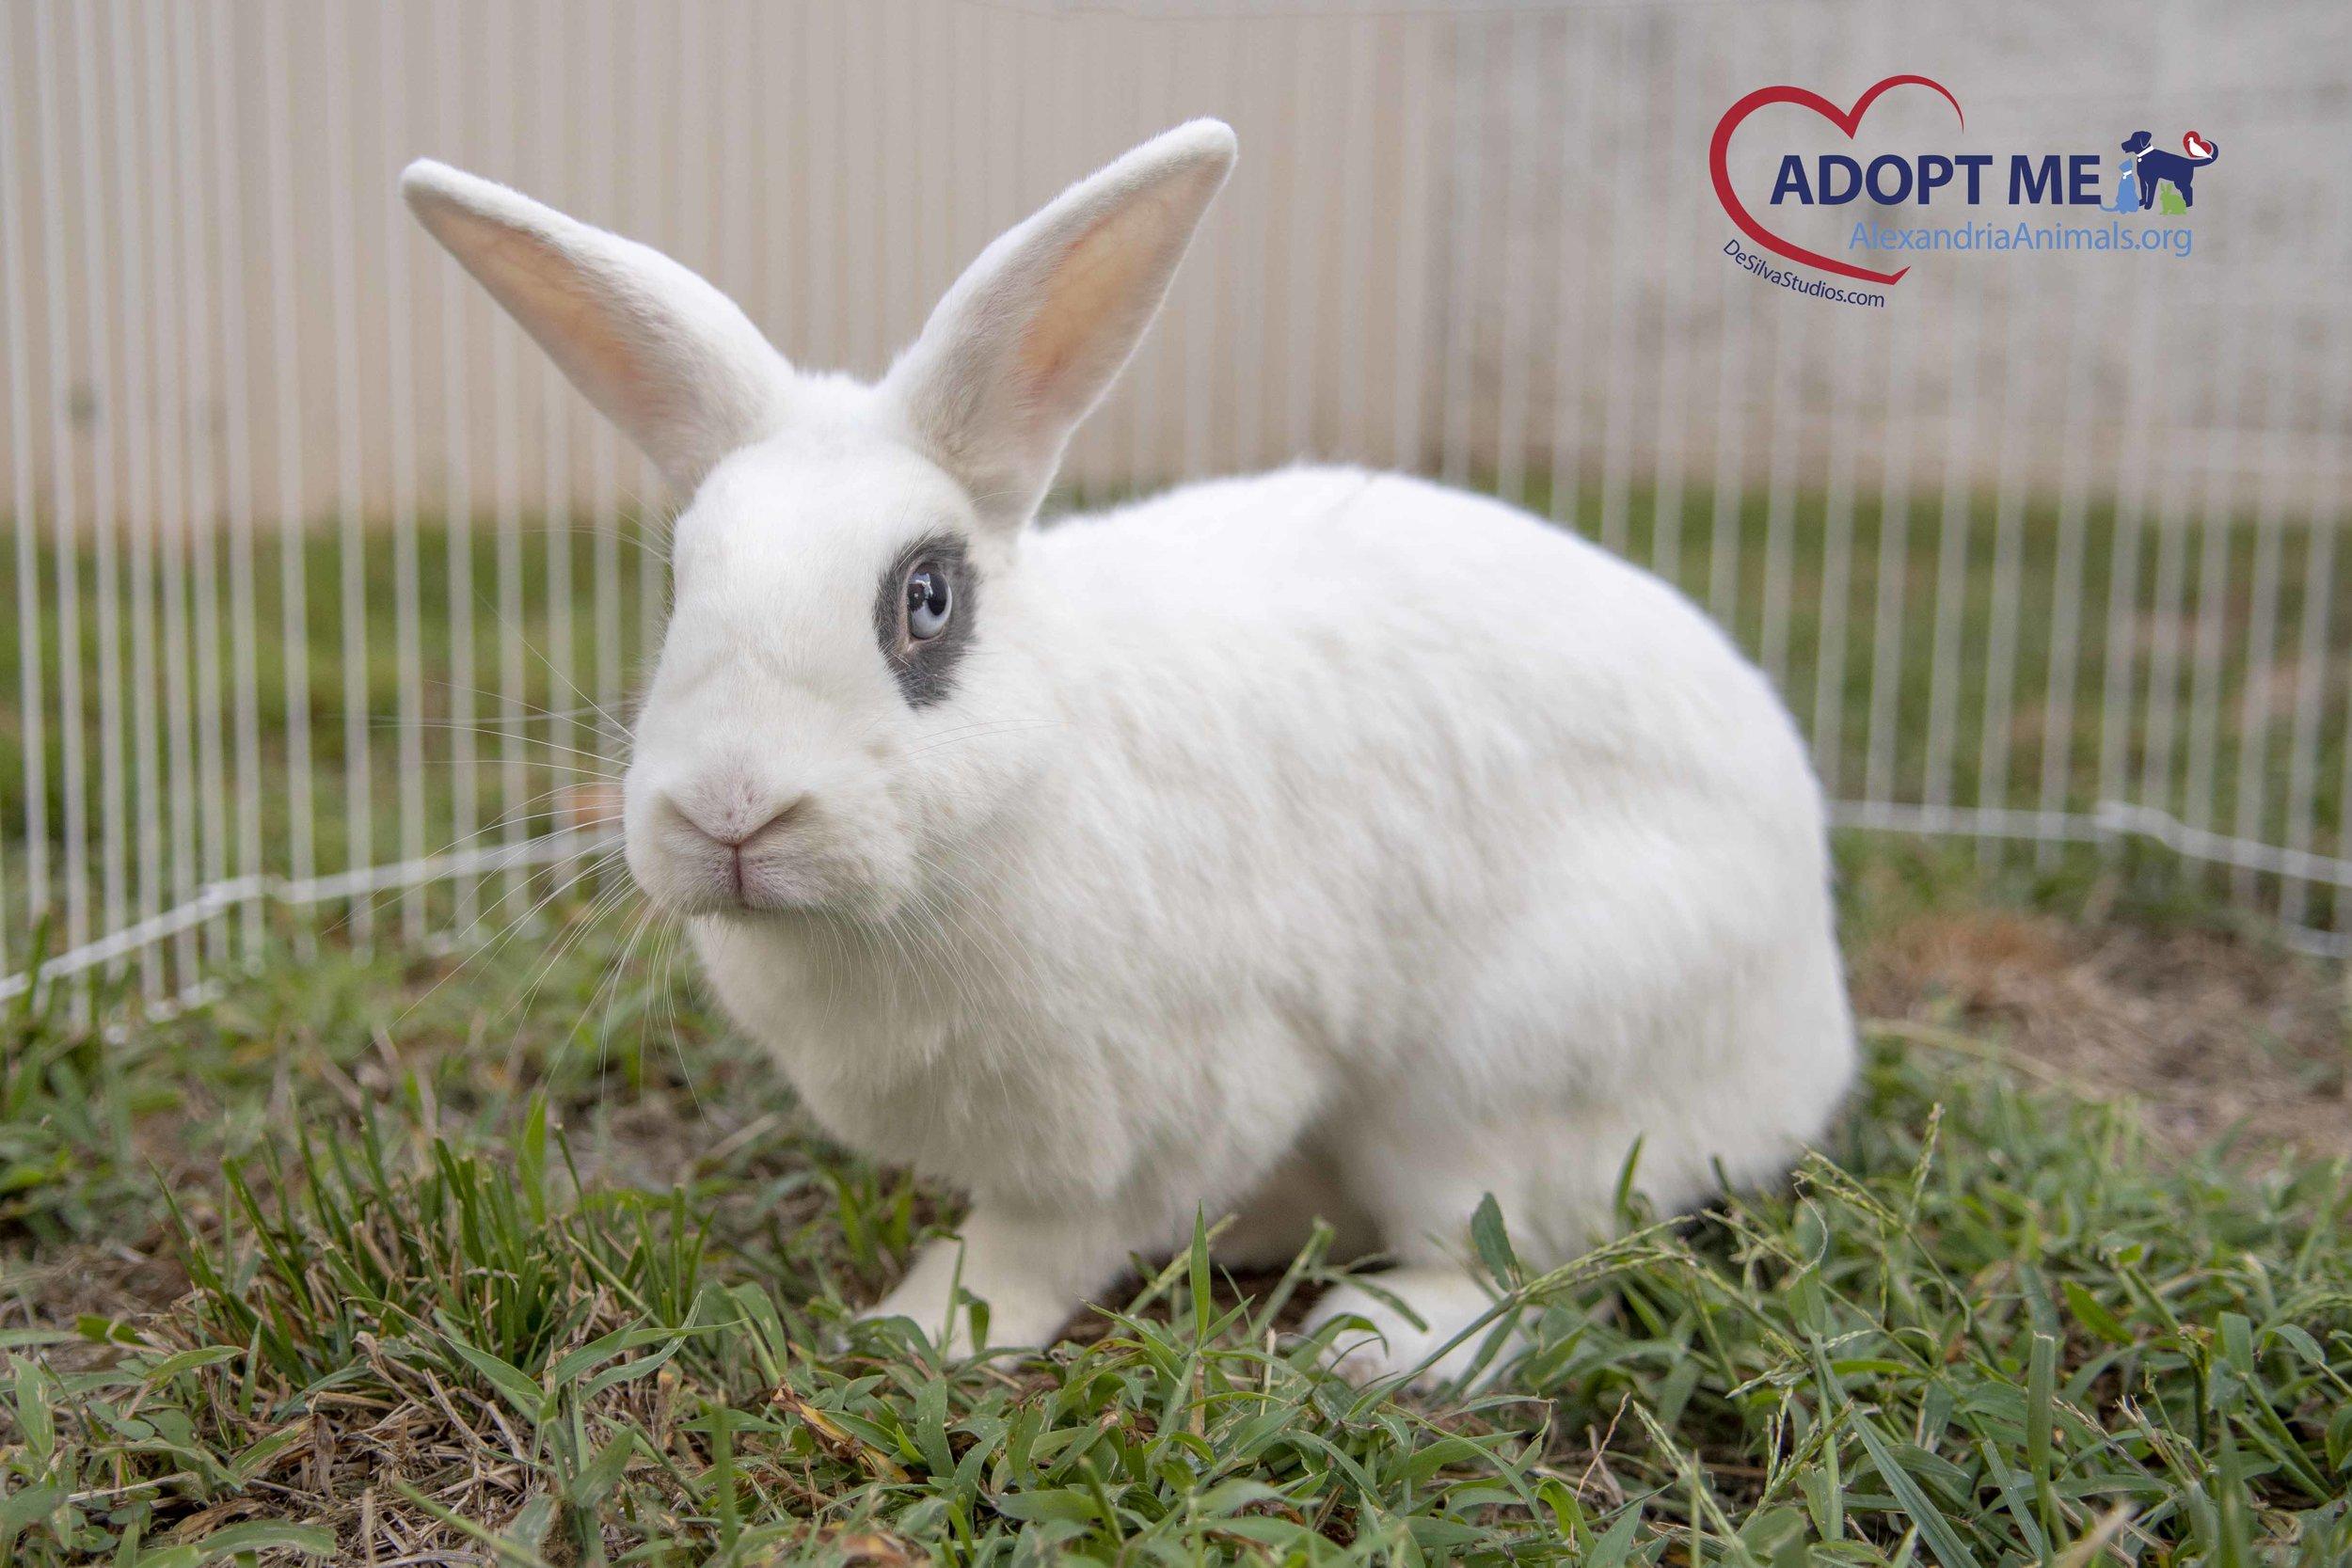 Phoobe_Rabbit_AWLA_09182019-01.jpg